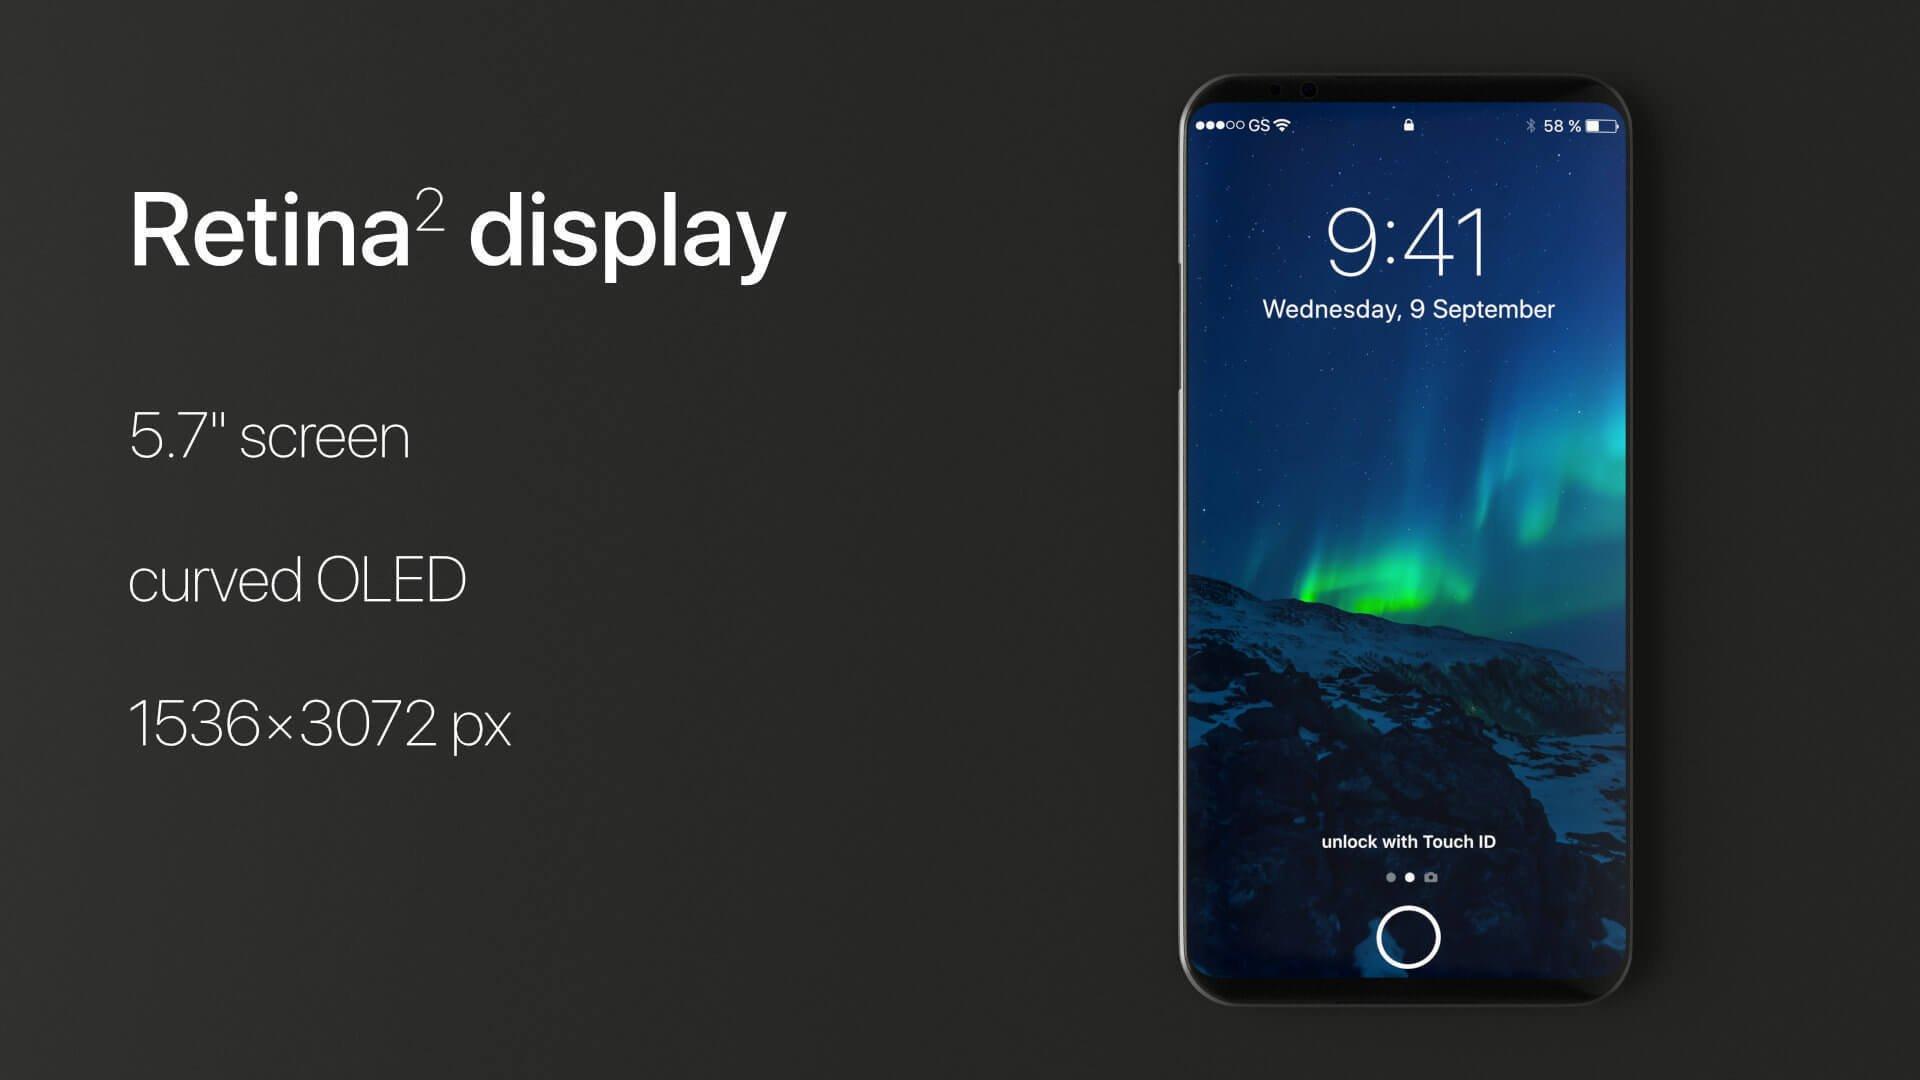 iPhone X sreen